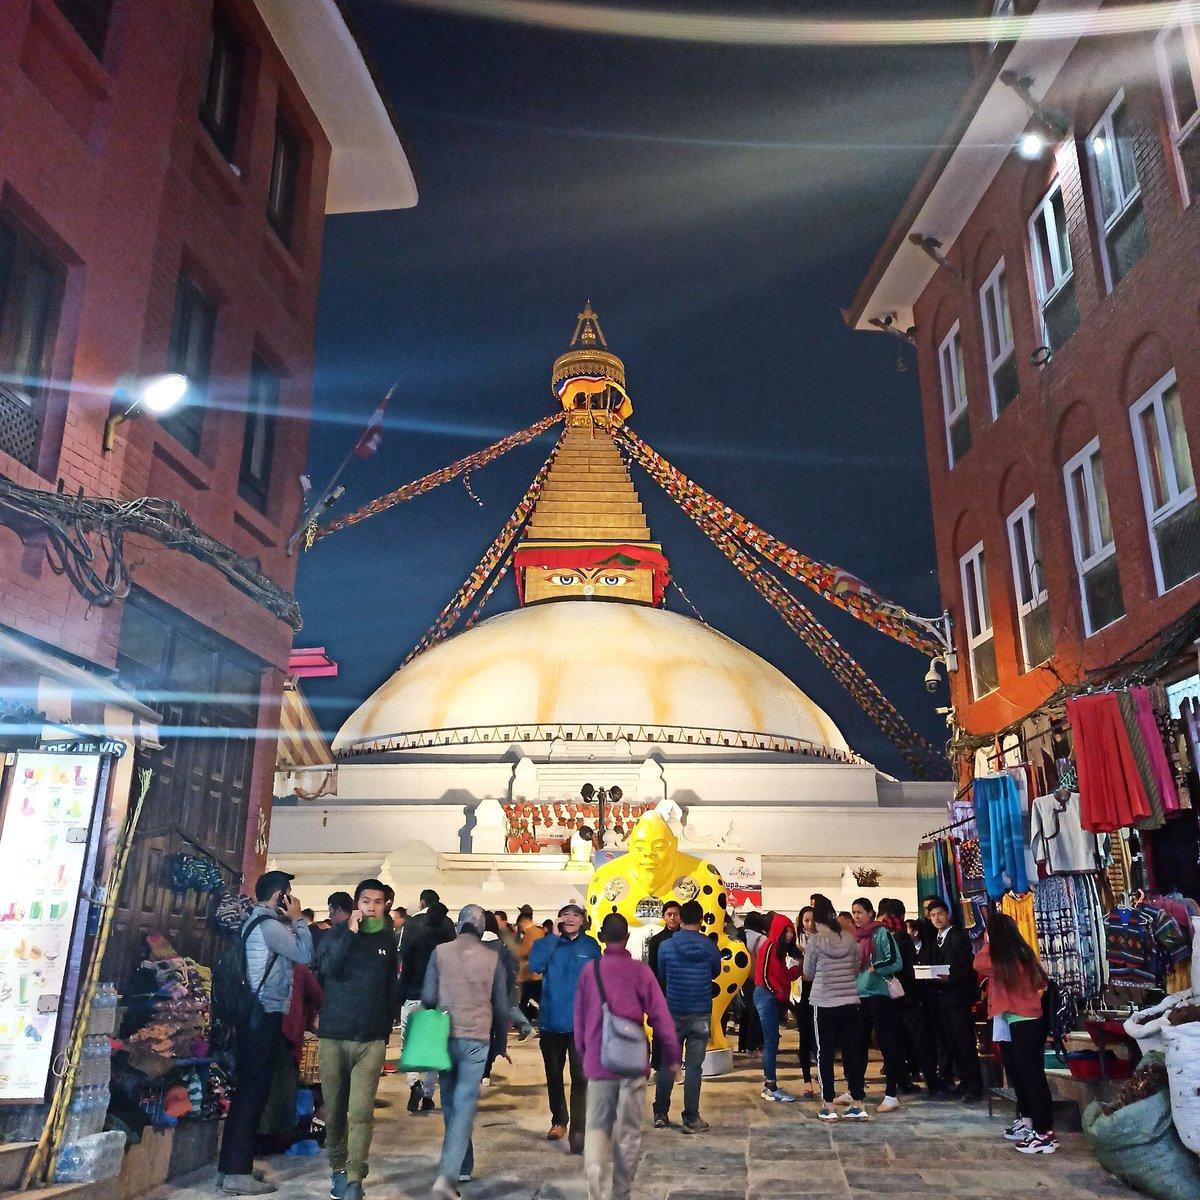 The entrance of Bouddhanath stupa, Nepal#travelnepal #travel #visitnepal2020 #photography #traverseynepal  #himalayas #town #snowwhite #nepal #traveller #trekking #hiking #adventure #winter #winterishere #mobilephotography #click #bluesky #sky #bouddhanath #stupa #peace #Buddha – at Boudhanath Stupa   बौद्धनाथ